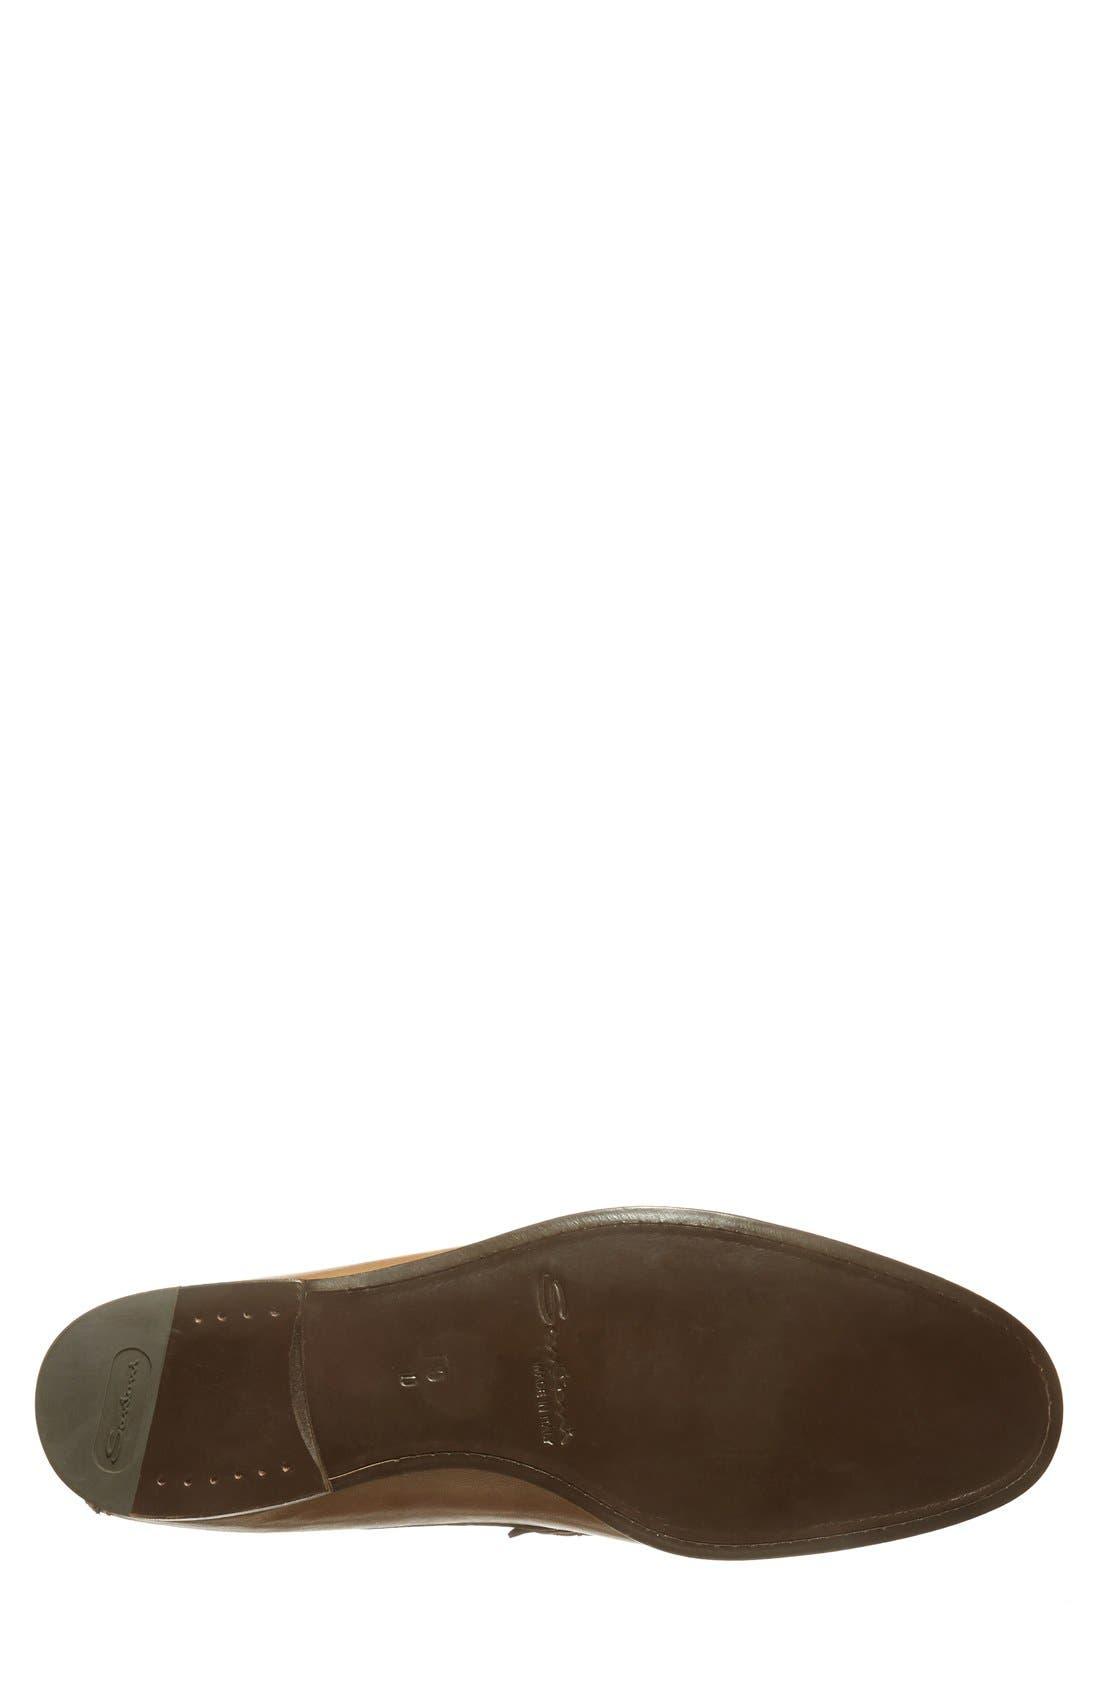 SANTONI,                             'Turner' Leather Penny Loafer,                             Alternate thumbnail 4, color,                             270